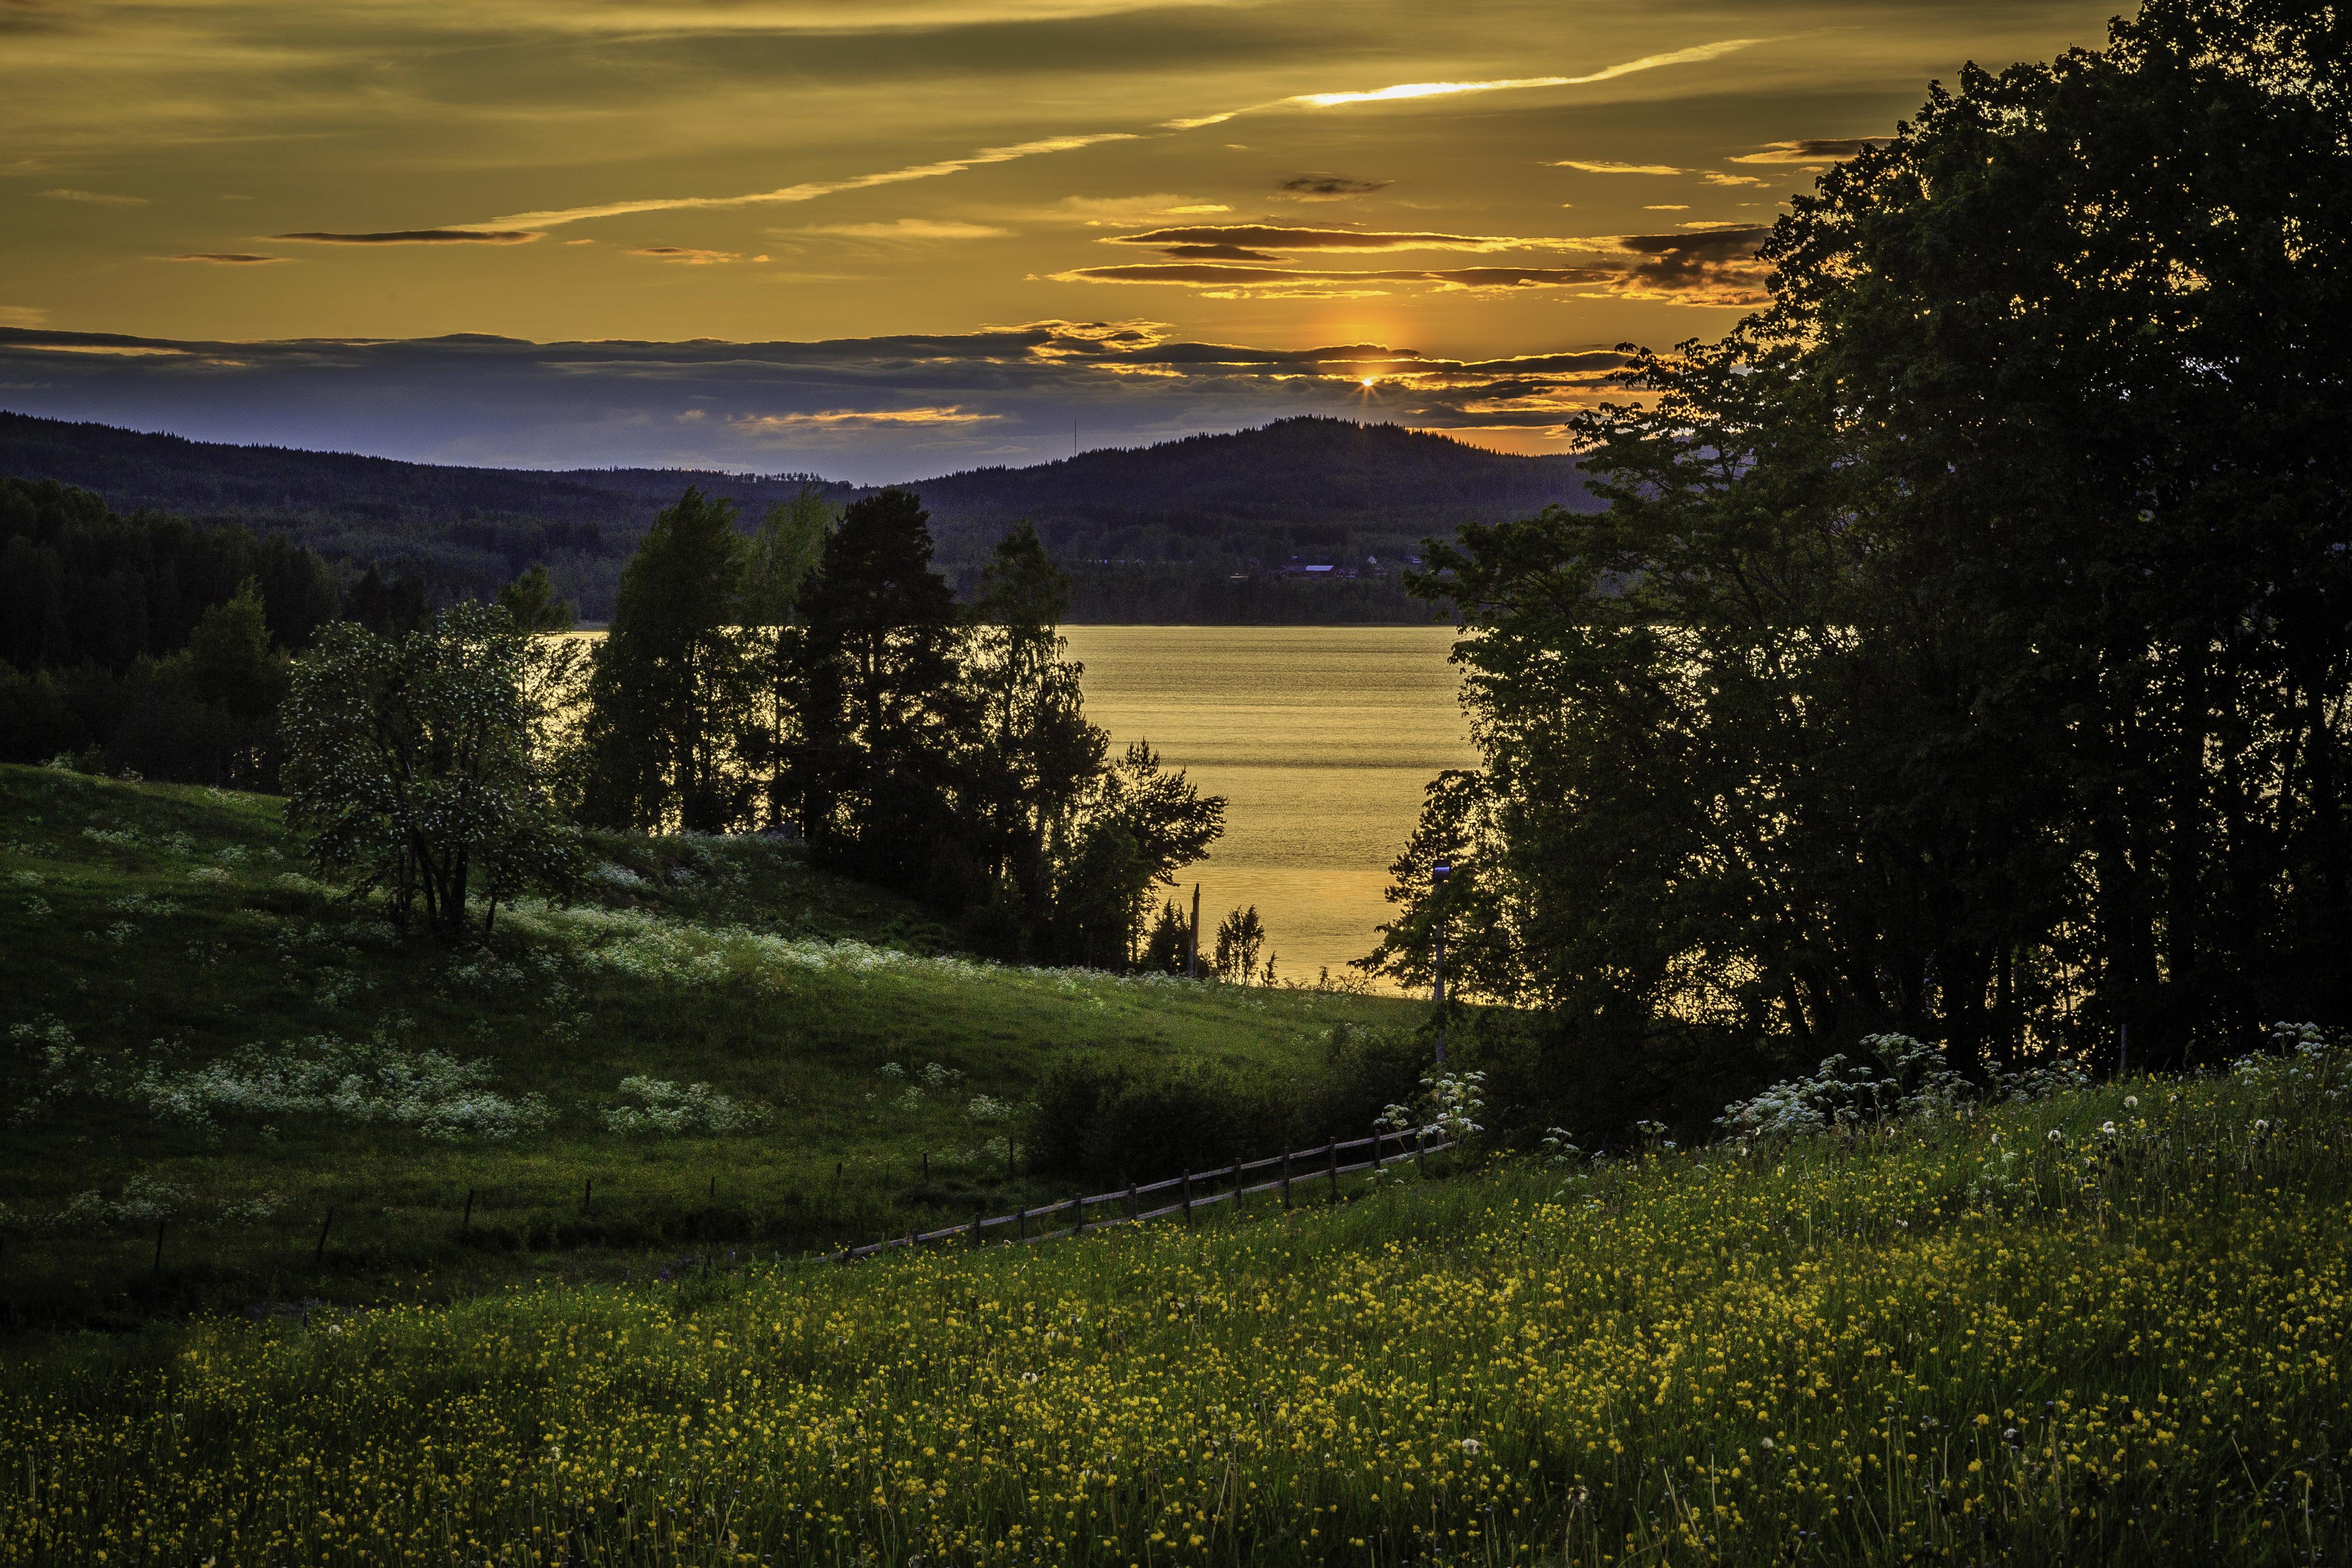 закат трава цветы озеро  № 1025285 бесплатно